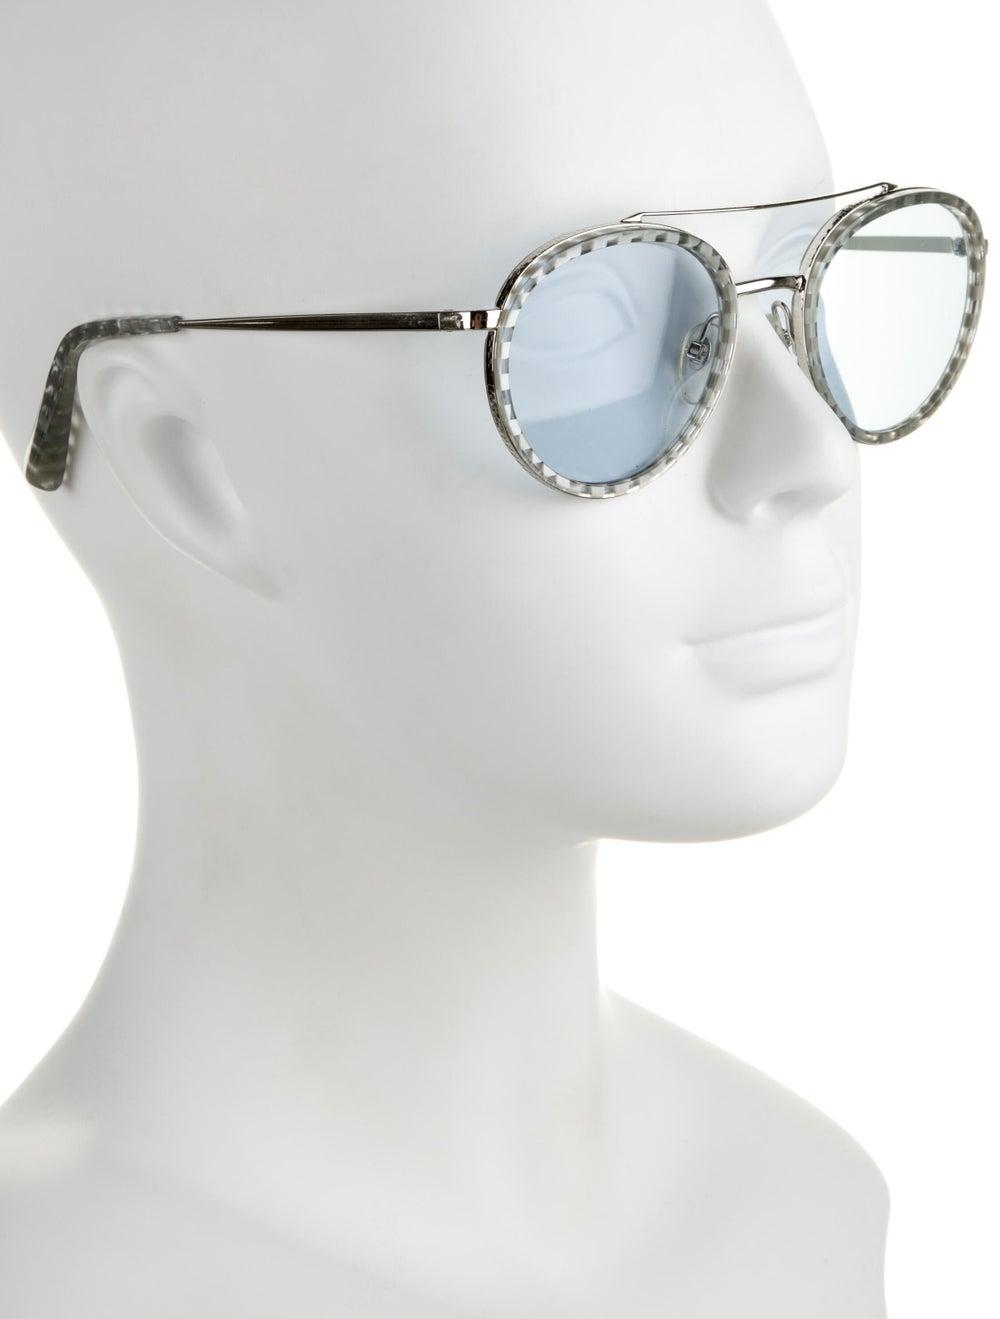 Alain Mikli Tinted Round Sunglasses Silver - image 4